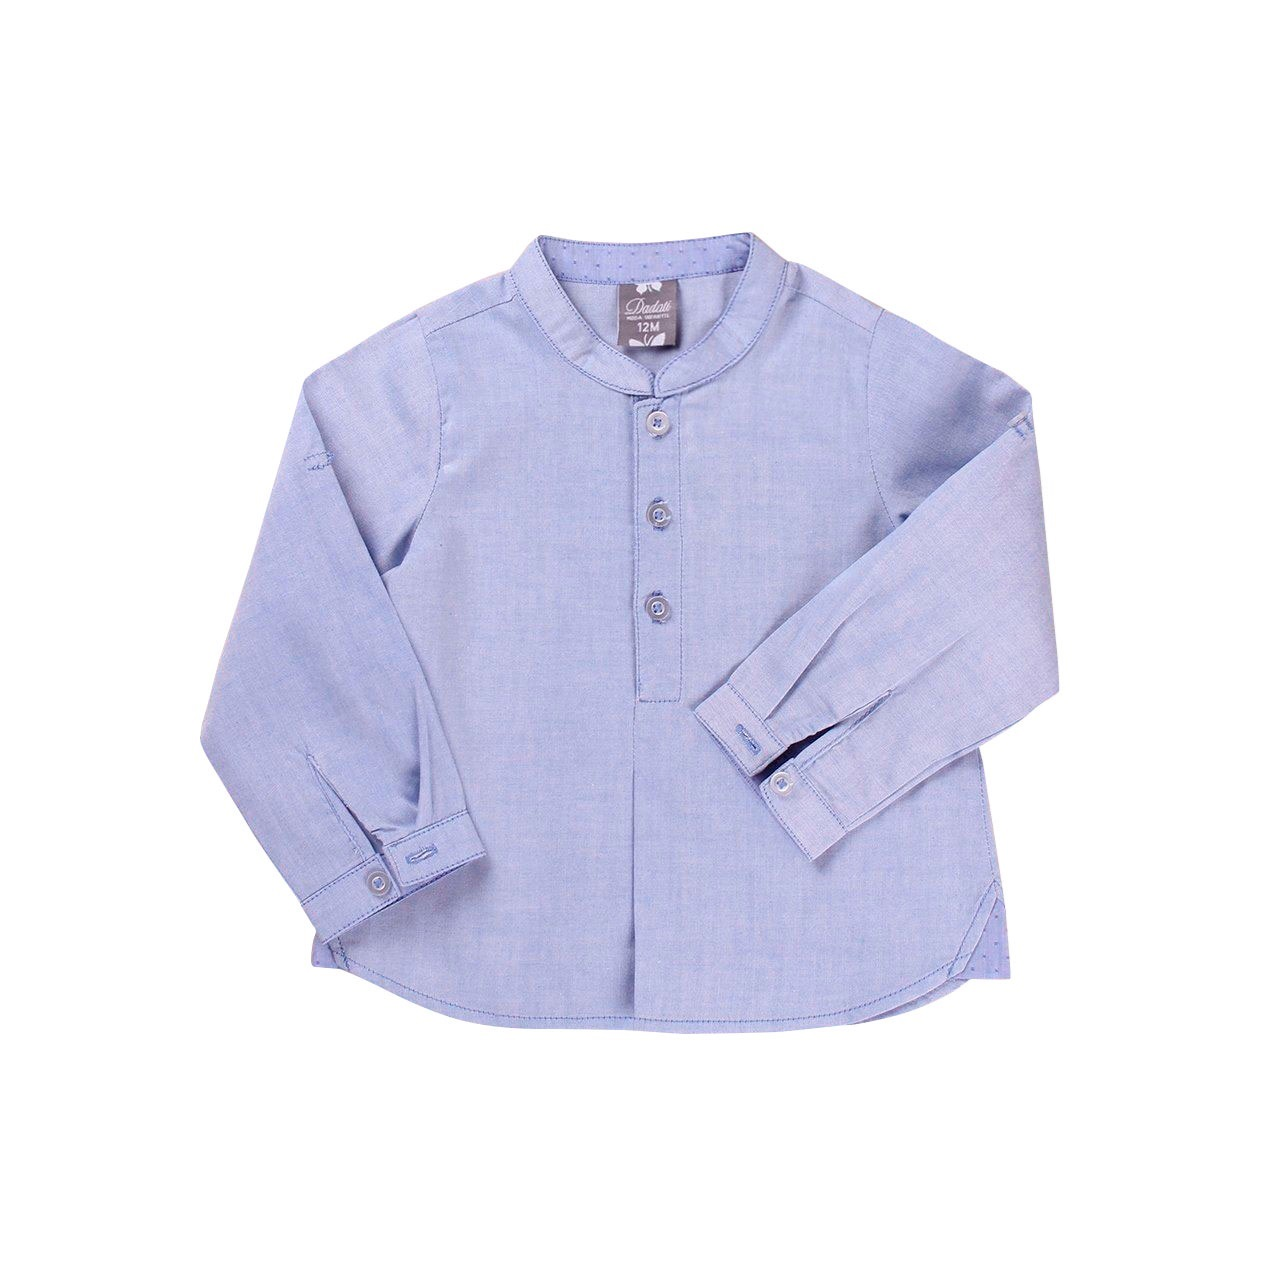 Imagen de Camisa bebé oxford azul